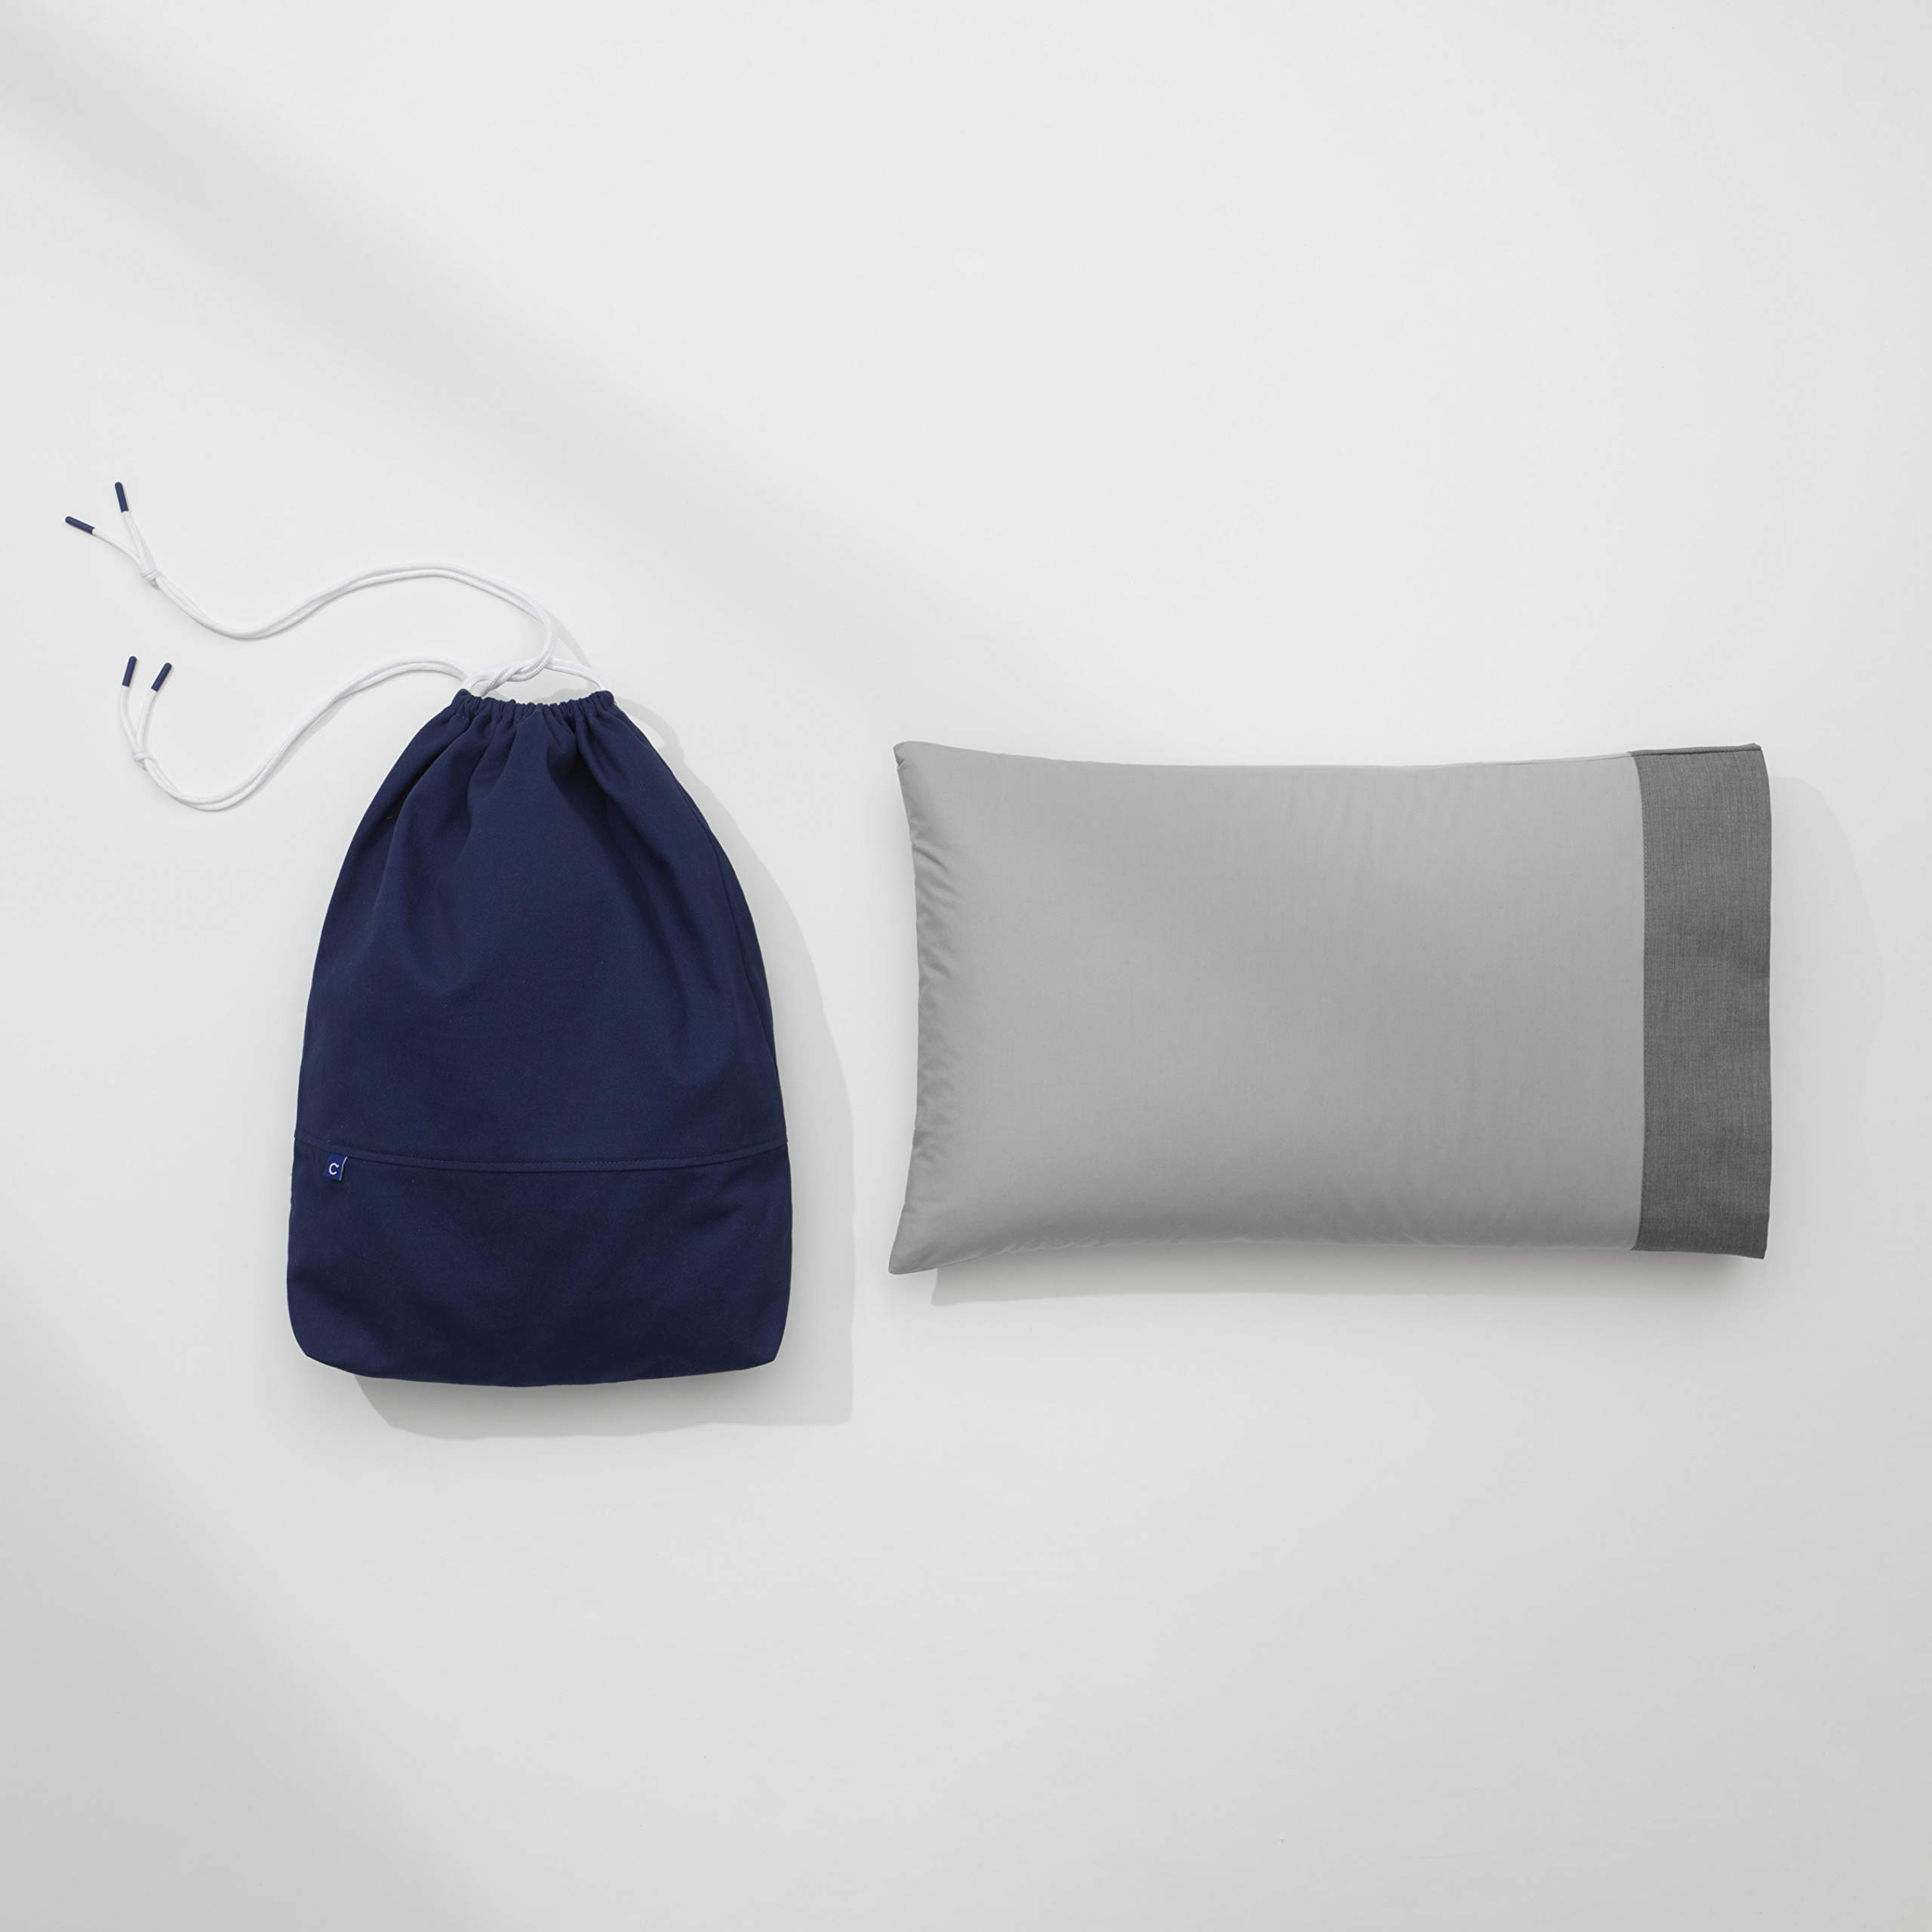 (CASPER) RED Nap Pillow, Perfect for Travel, Silk-Like Cotton Texture by Casper Sleep